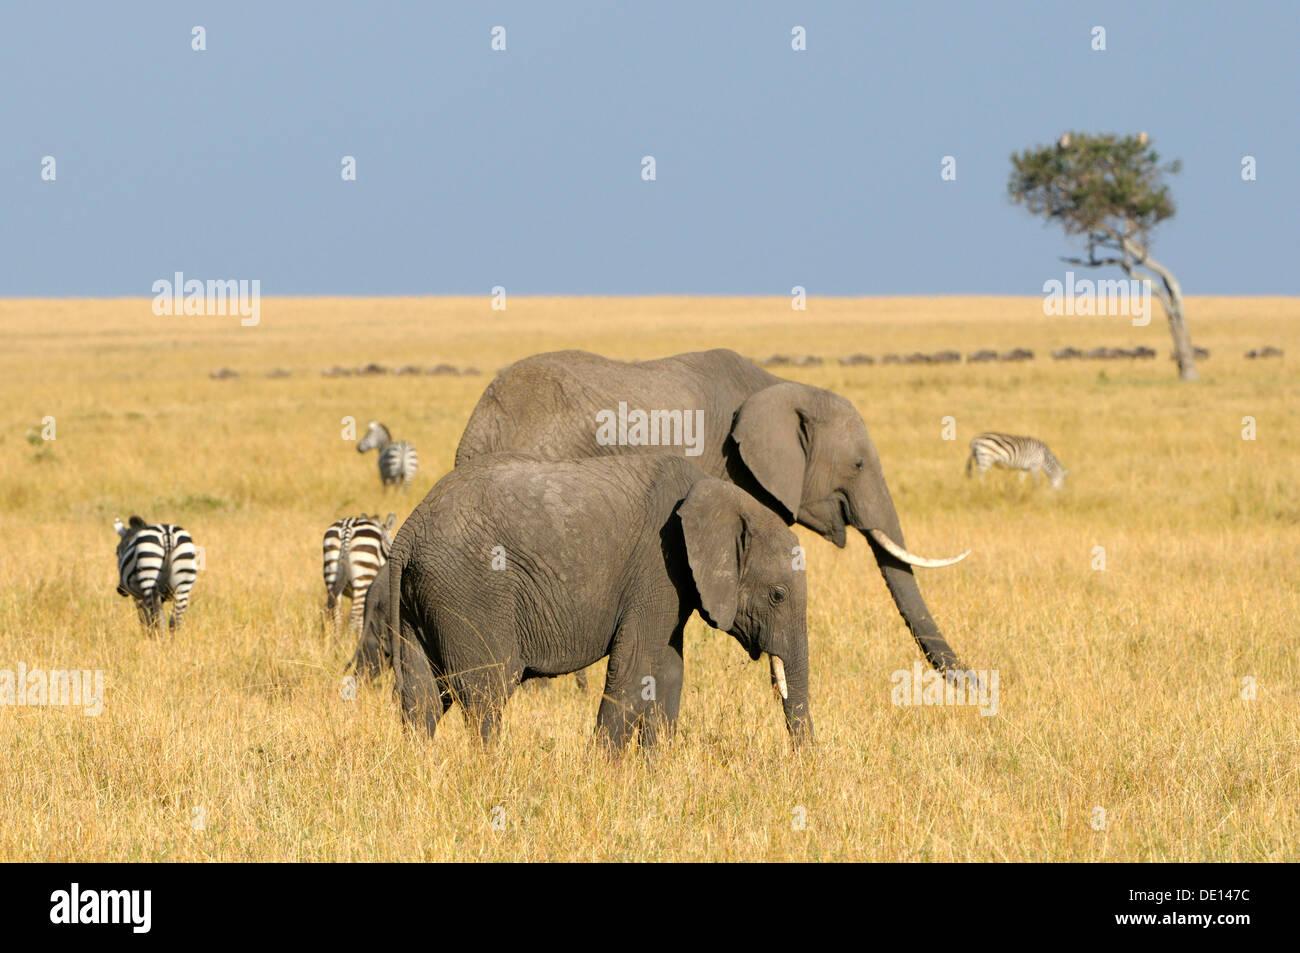 Bush Elefante africano (Loxodonta africana), grupo vagando por el paisaje, la Reserva Nacional de Masai Mara, Kenia, África oriental, África Imagen De Stock